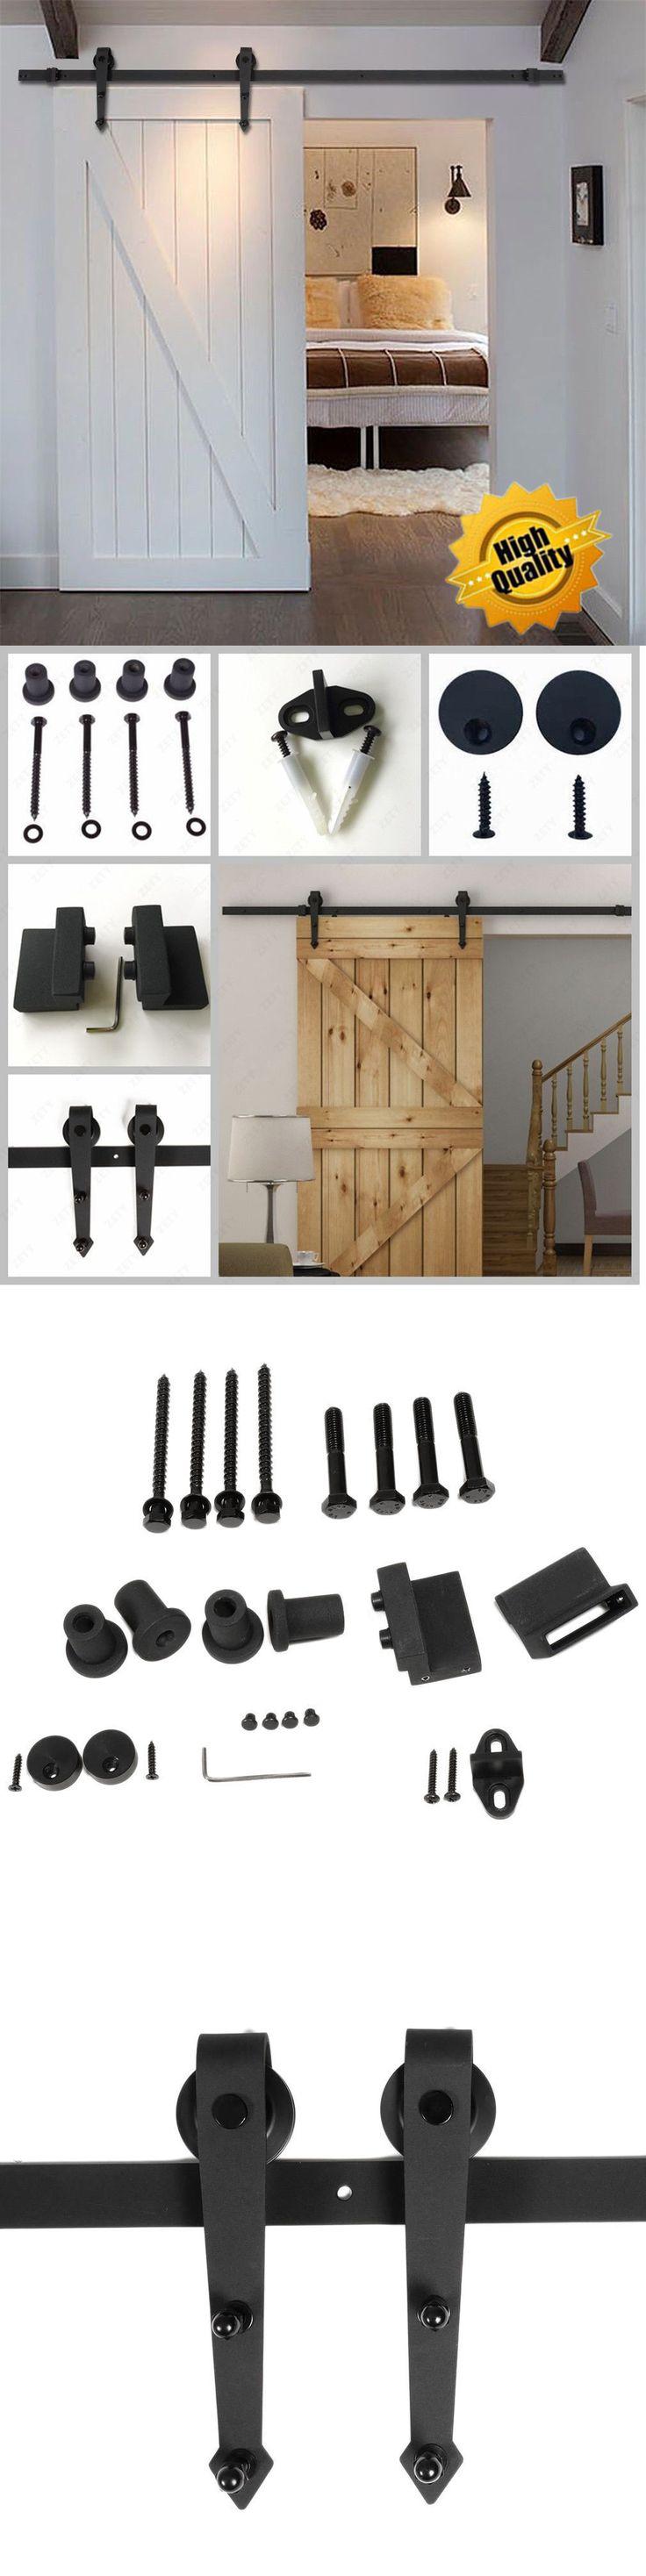 Other Door Hardware 20593: 10Ft Heavy Duty Modern Barn Wood Sliding Door Hardware Track Closet Set Black Bp -> BUY IT NOW ONLY: $66.43 on eBay!